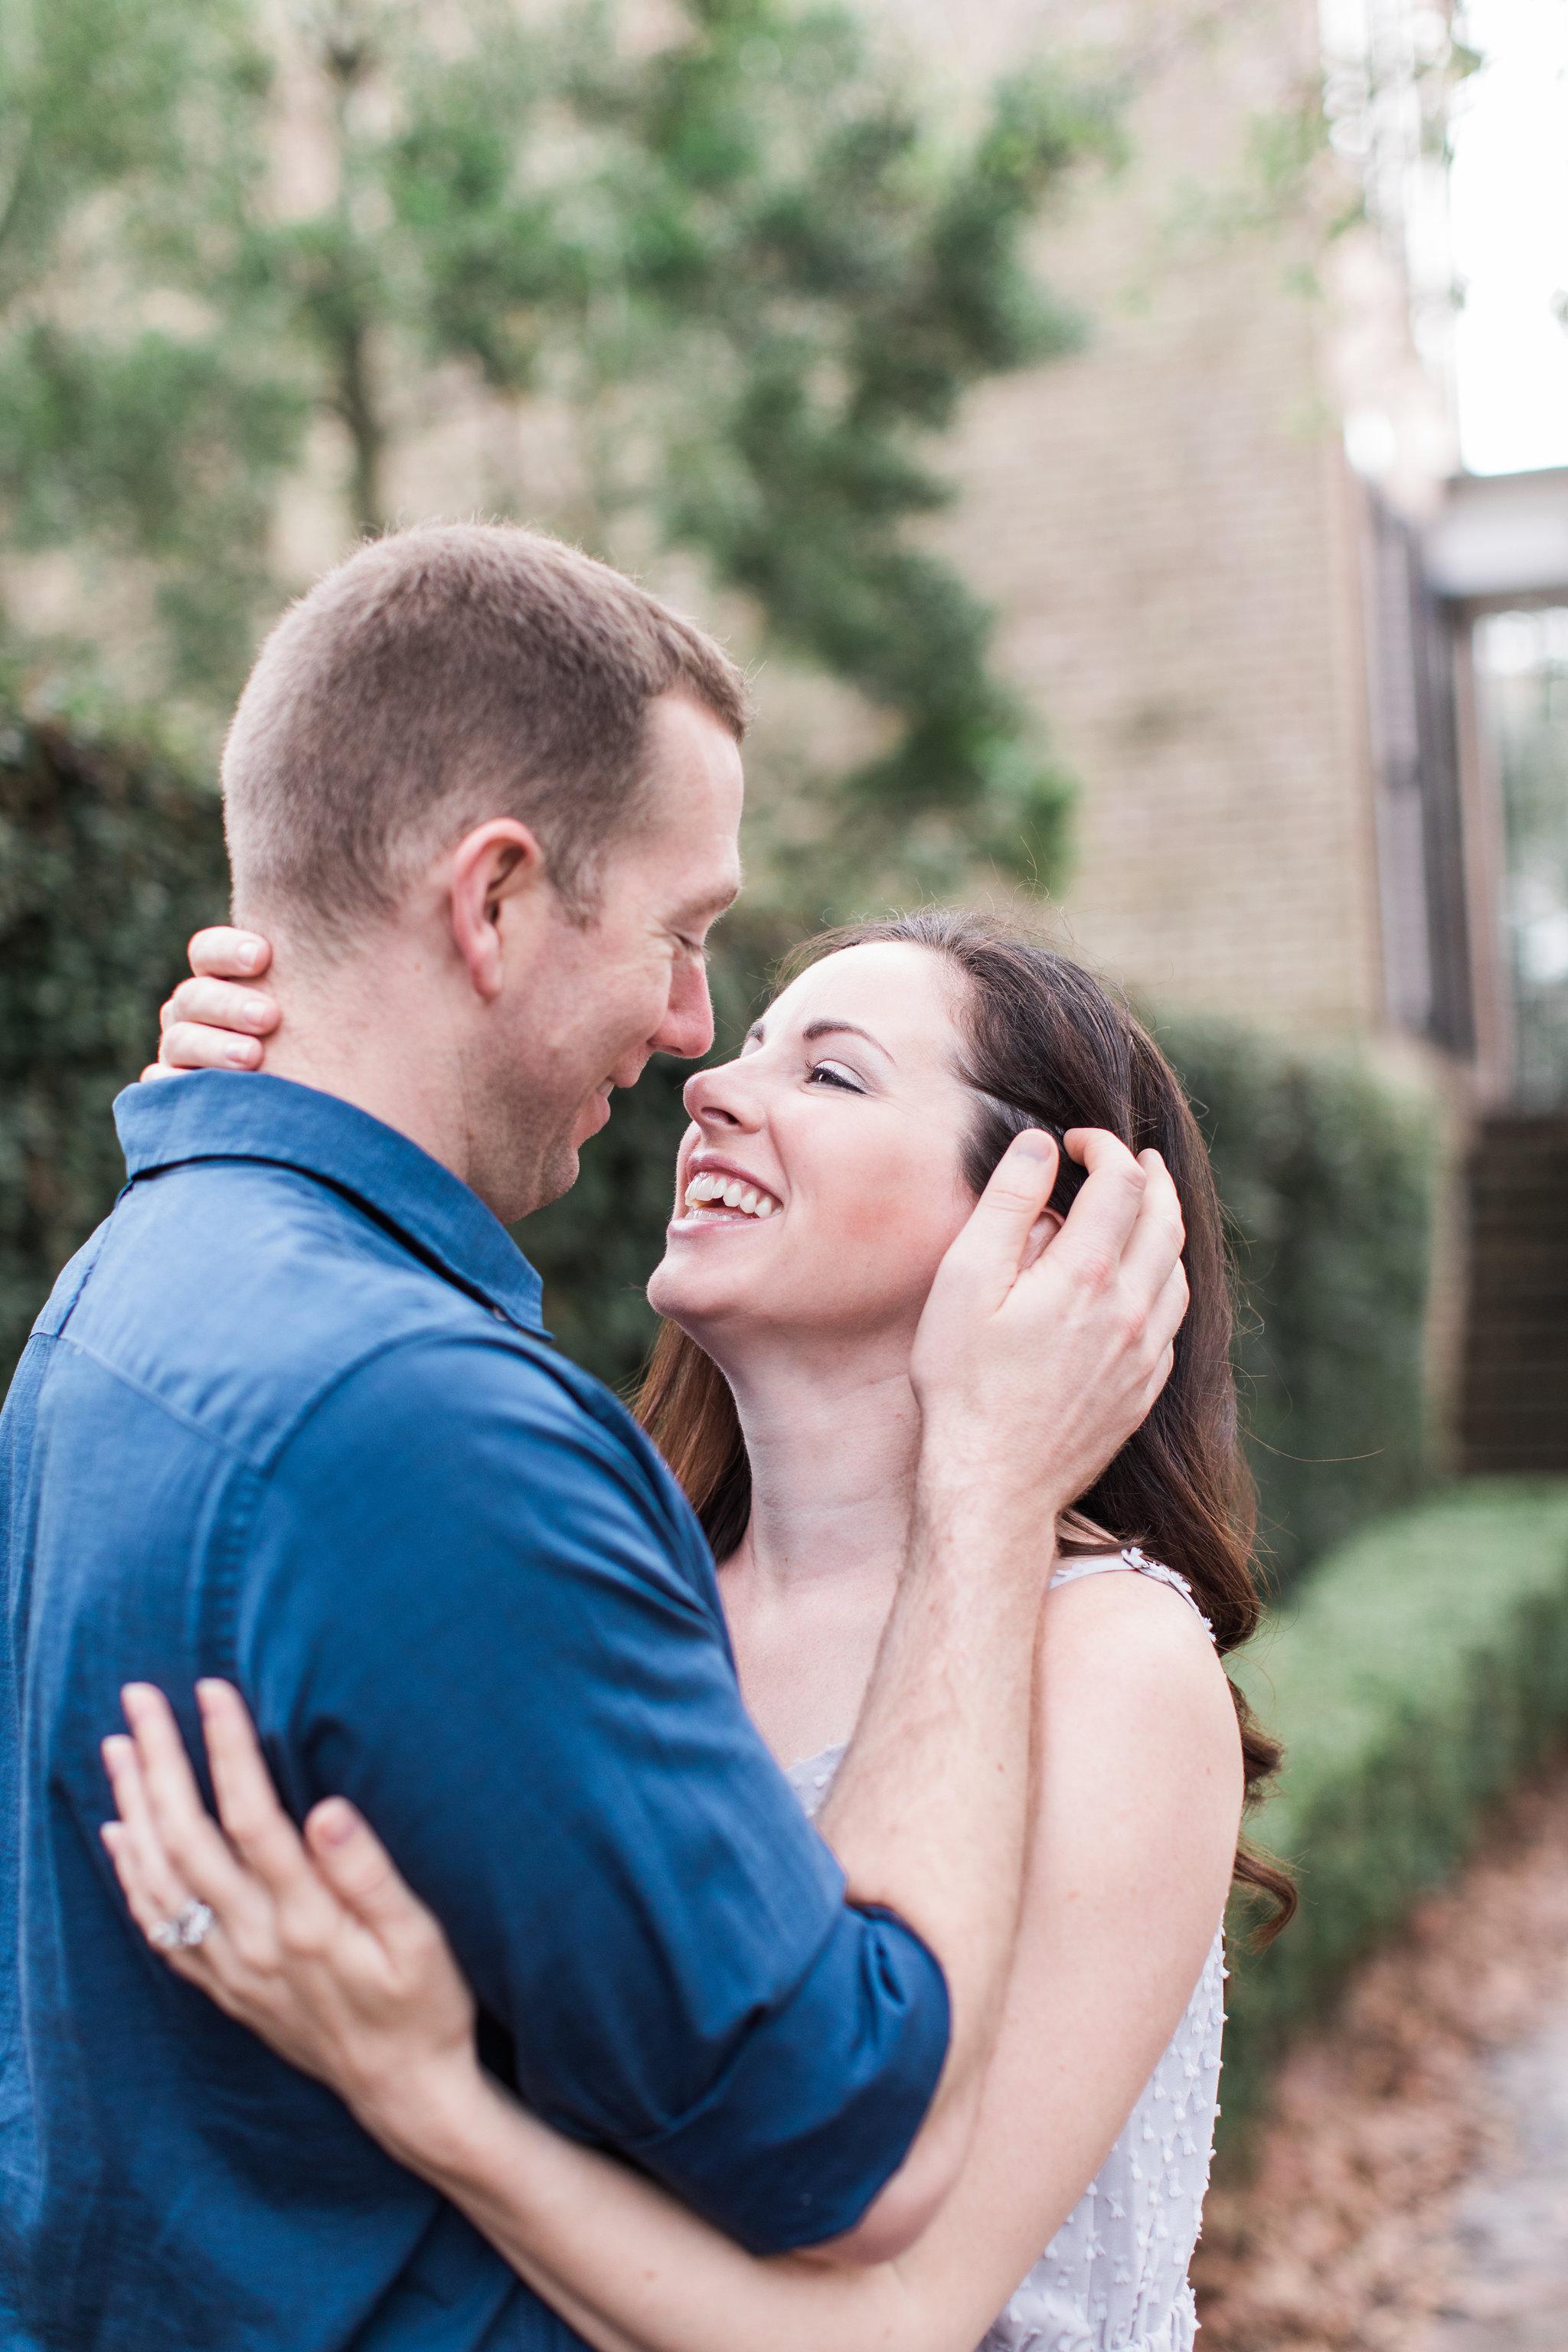 apt-b-photography-ansley-dj-memorial-shoot-savannah-wedding-photographer-lifestyle-portrait-photographer-washington-square-couples-photography-32.jpg